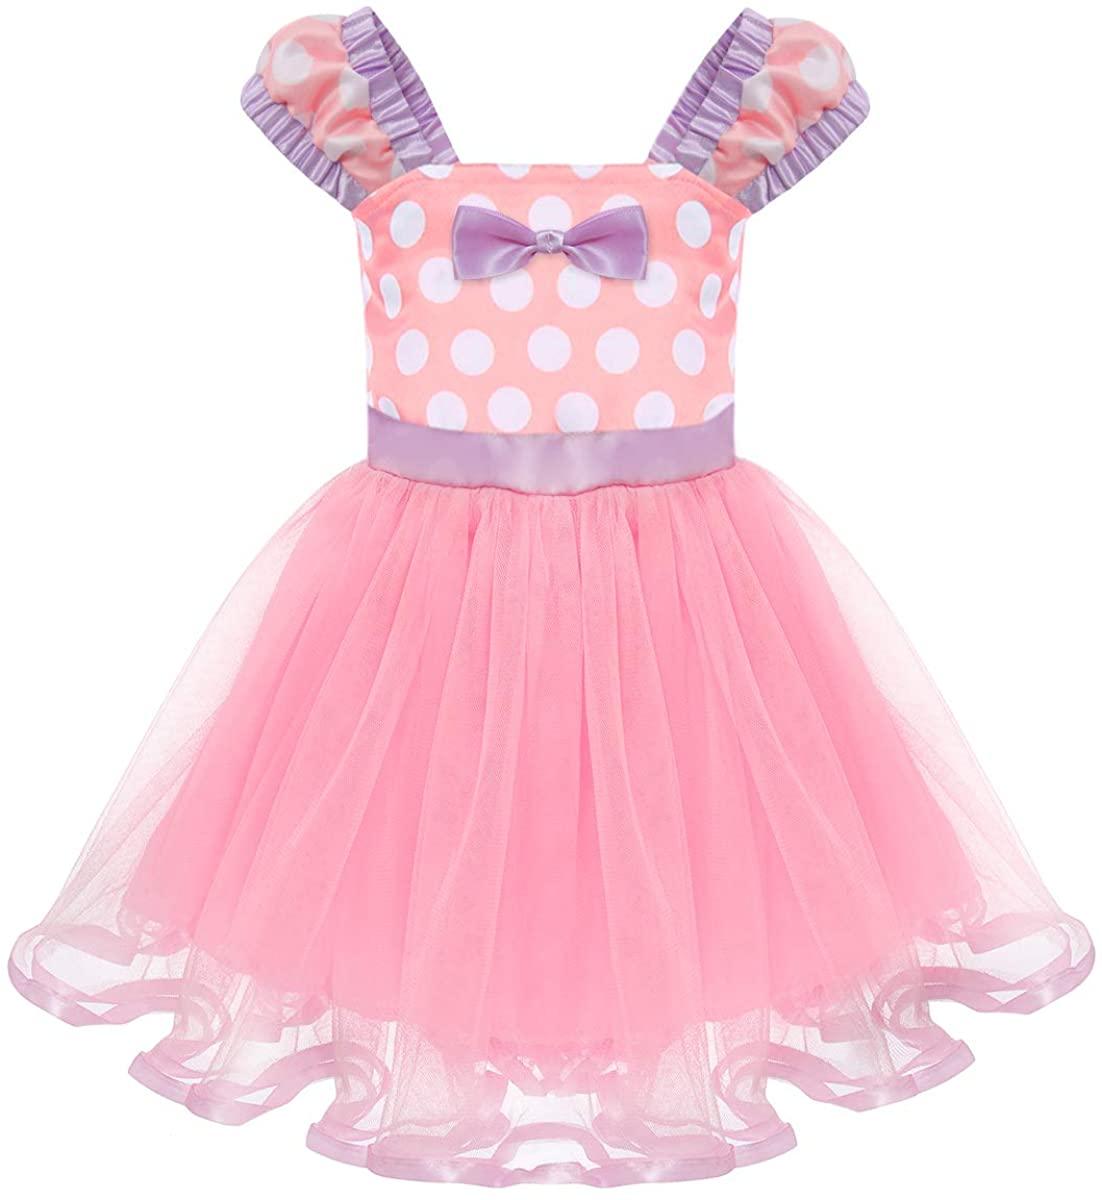 Toddler Girl Princess Polka Dots Christmas Birthday Costume Bowknot Ballet Leotard Tutu Dress Up+3D Mouse Ear Headband Light Purple Dress + Bow Ear Headband 4-5 Years